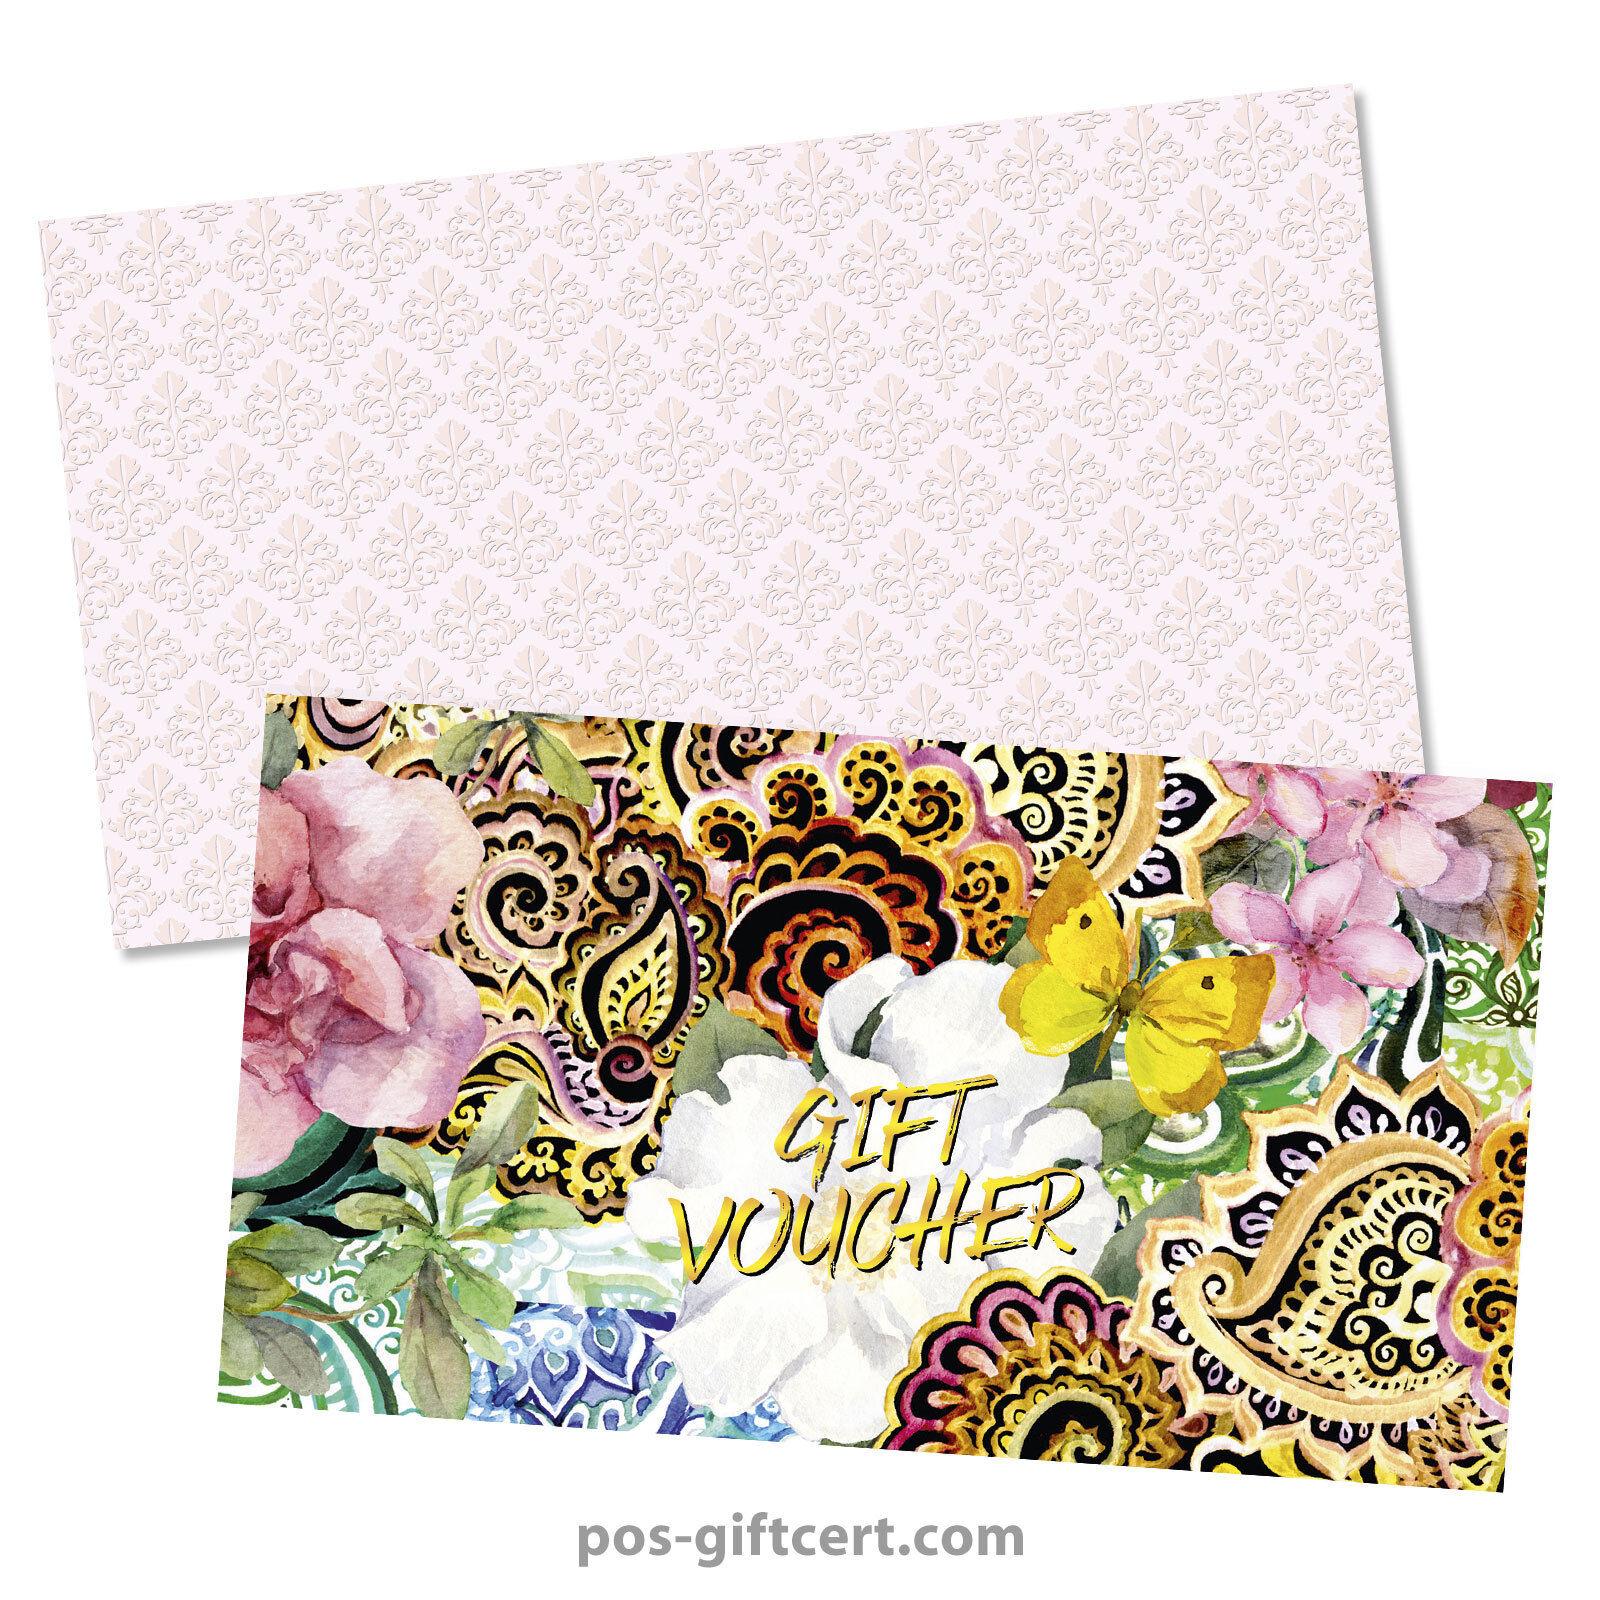 Universal veleno vouchers + envelopes for all occasions fa264gb